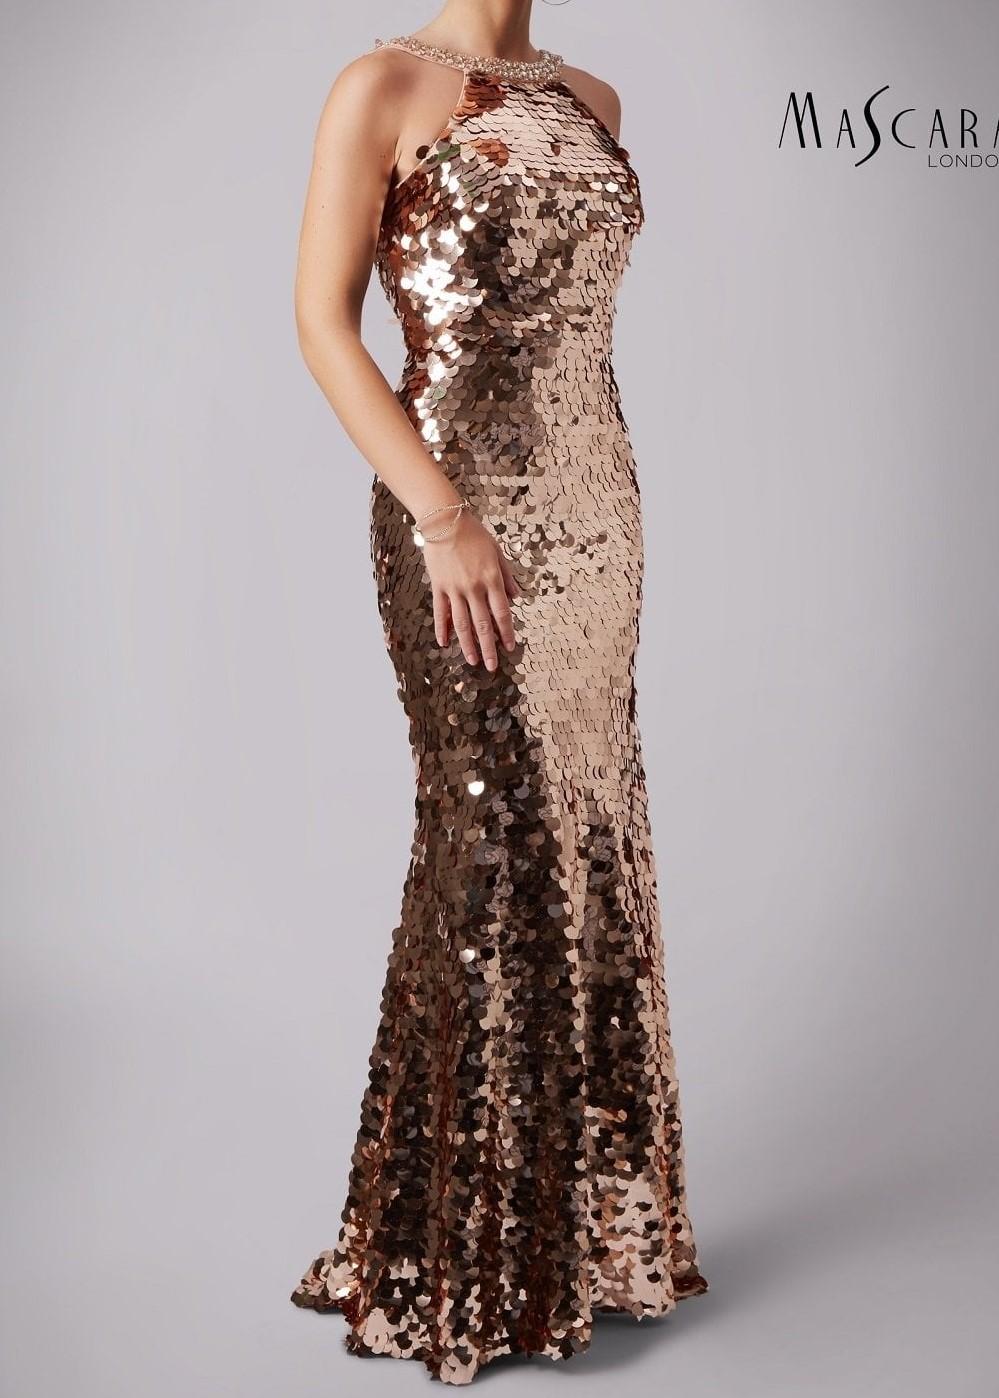 Mascara london mc166125 prom dress norwich prima donna bridal